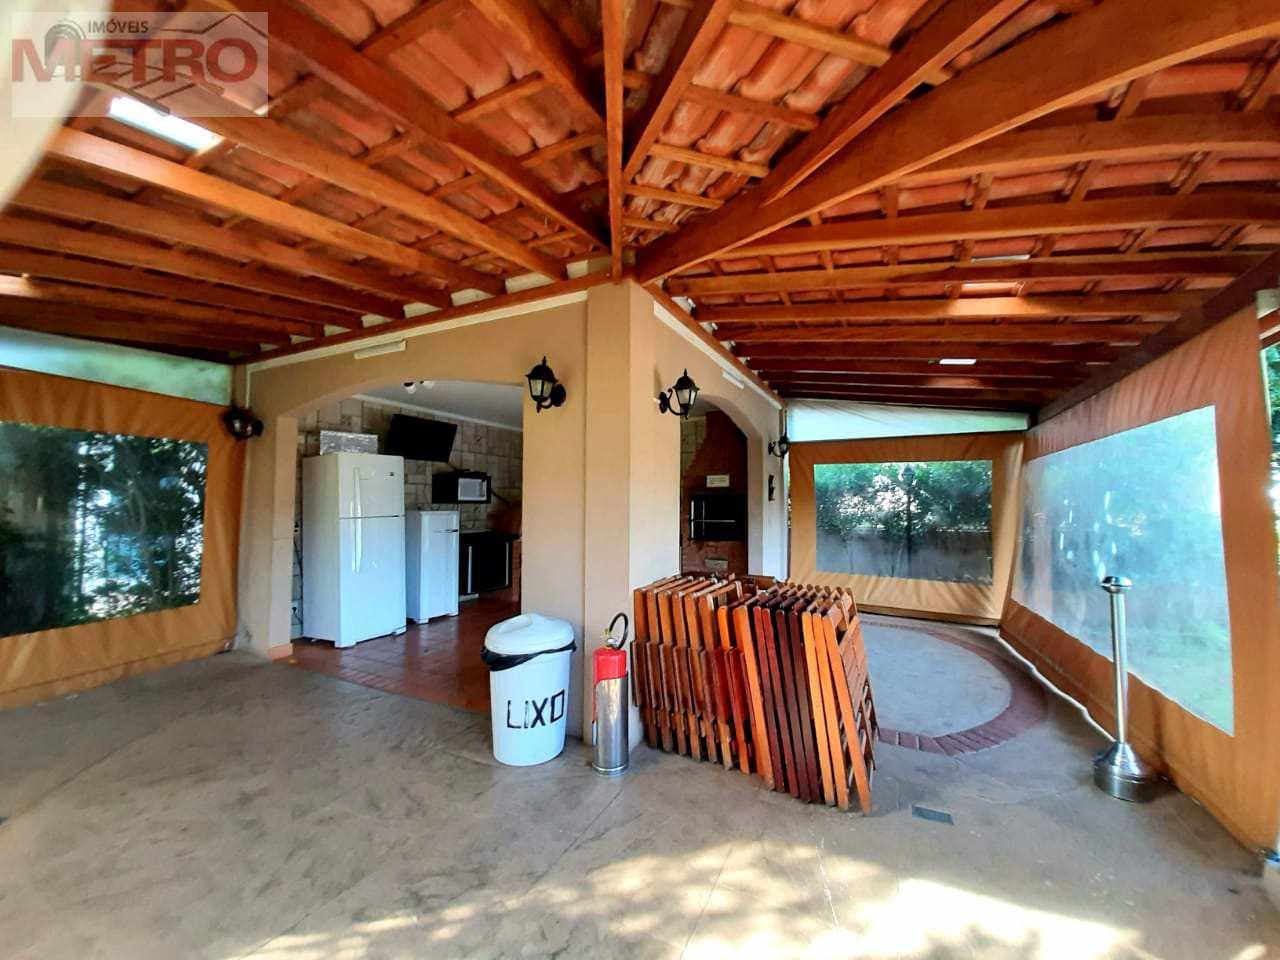 Apartamento com 2 dorms, Vila Santa Catarina, São Paulo - R$ 325 mil, Cod: 90999